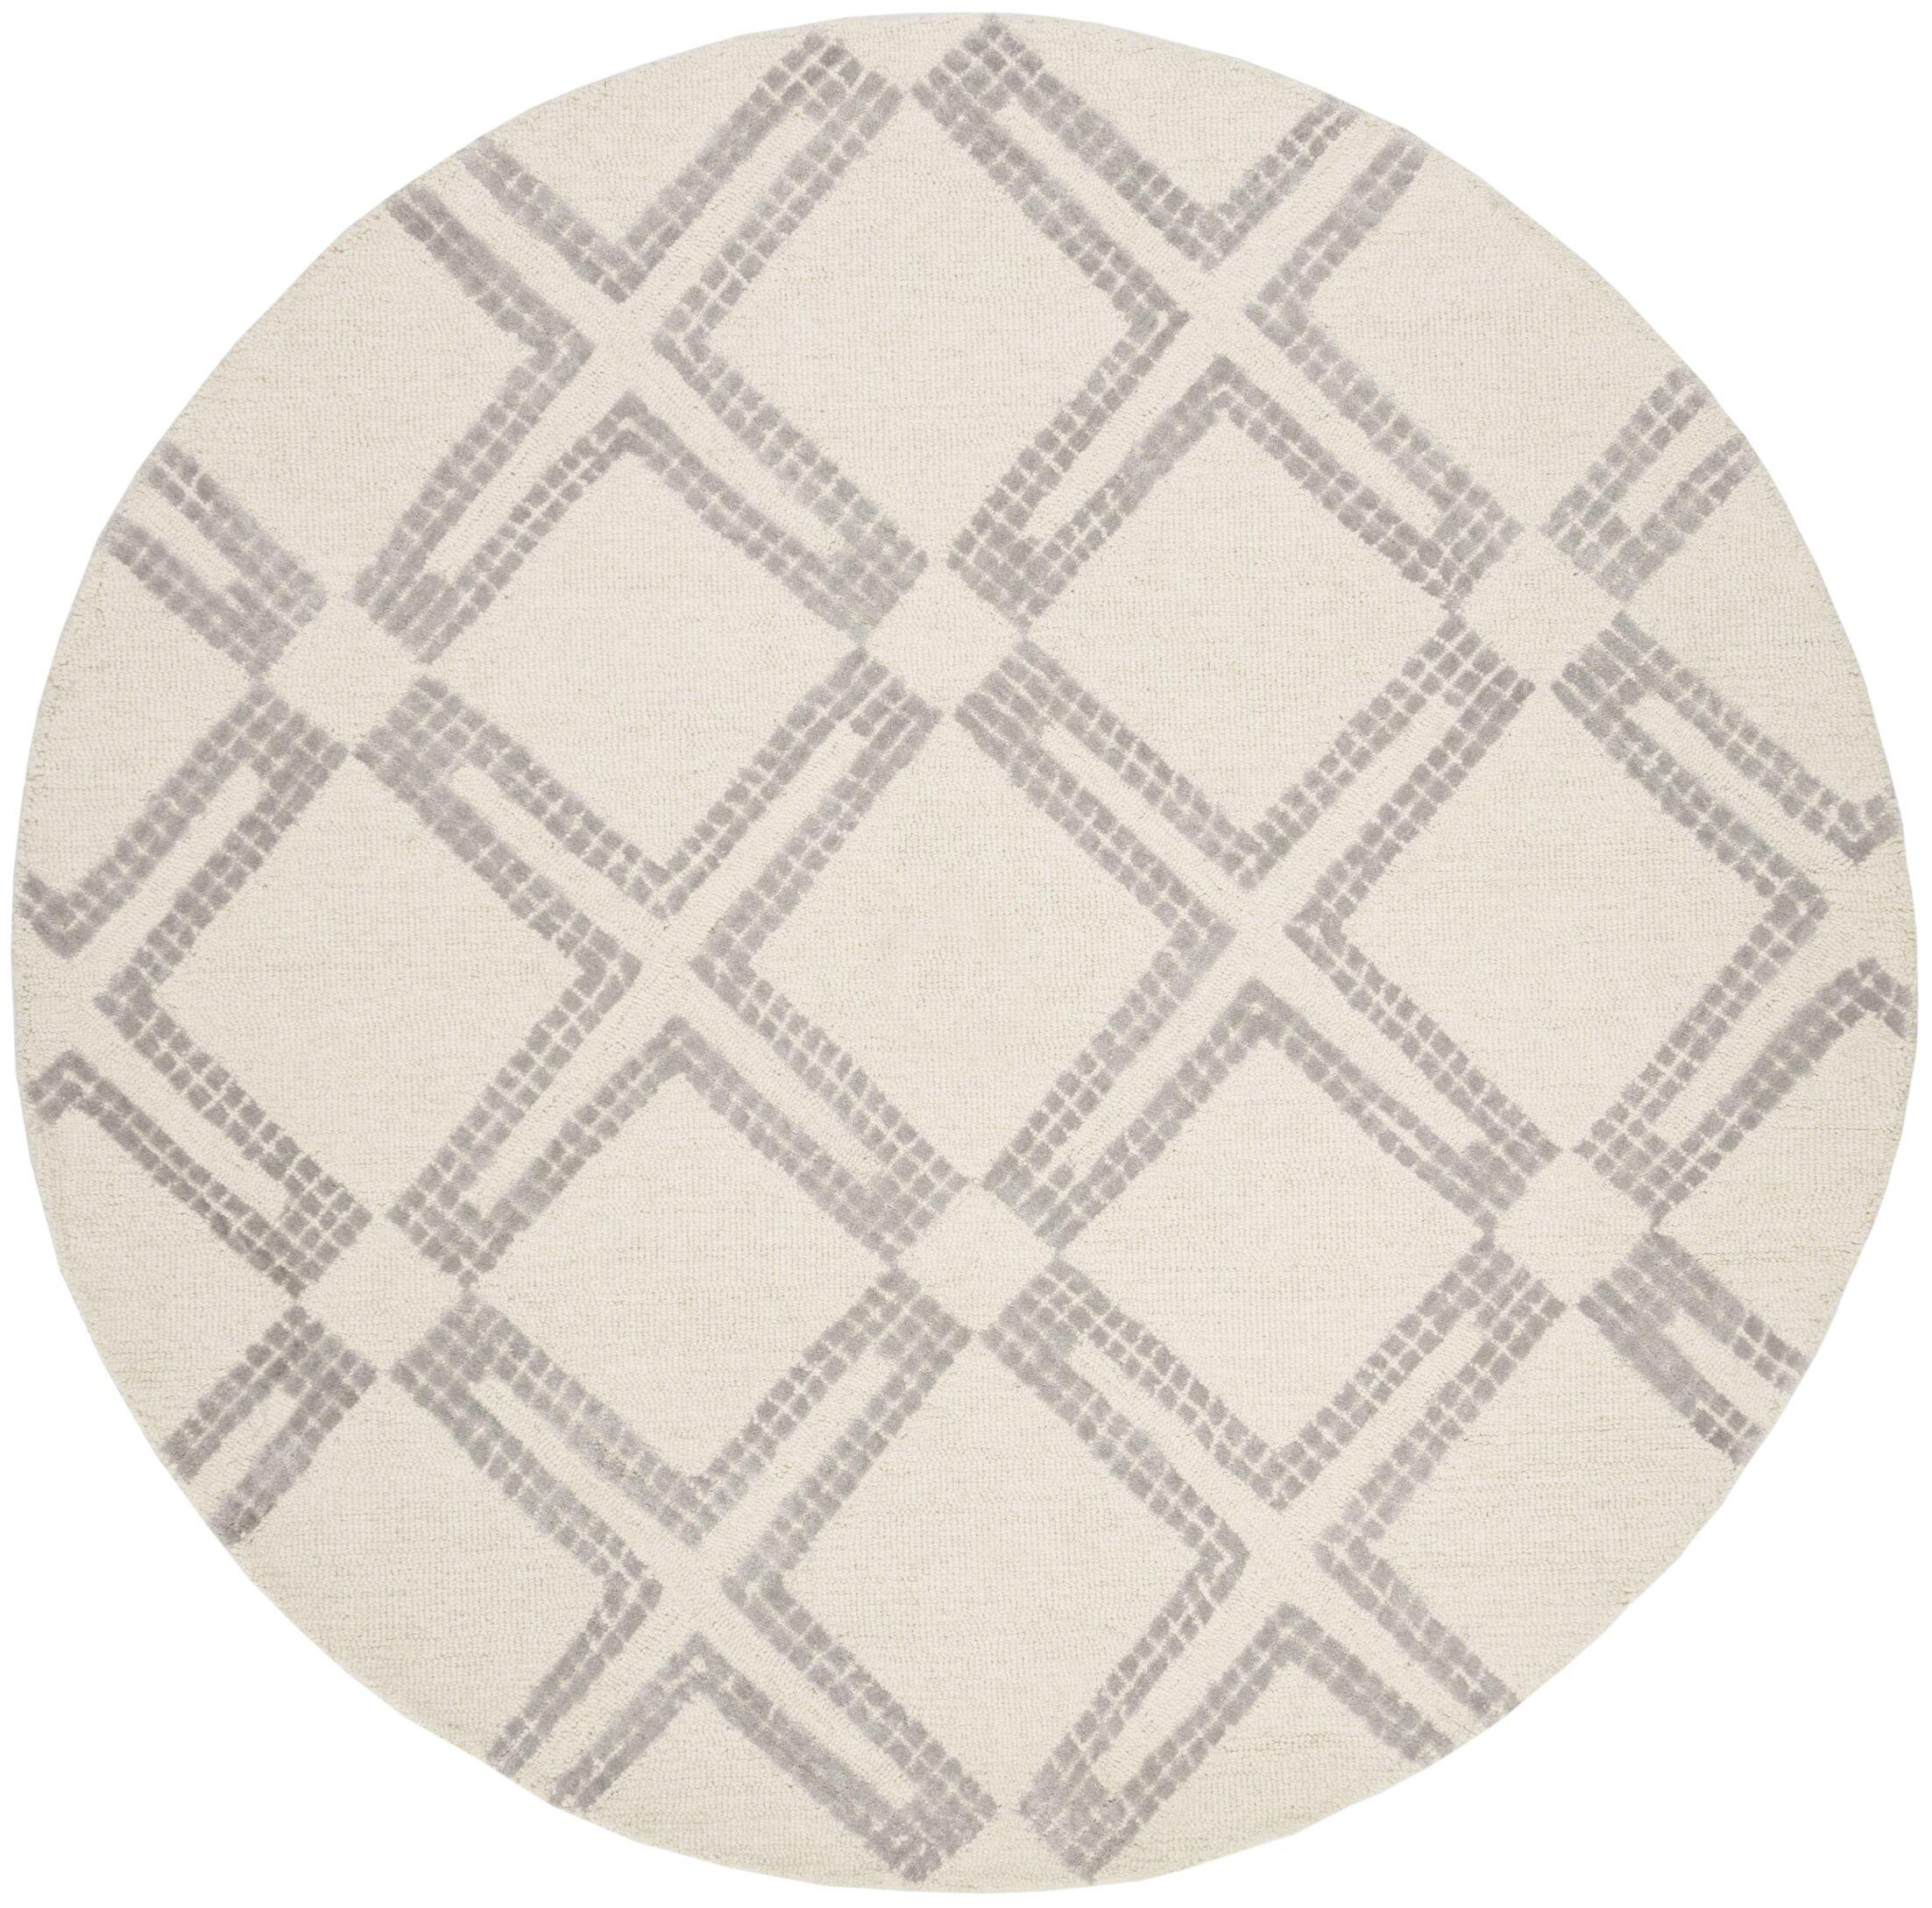 Blokzijl Hand-Tufted Ivory/Silver Area Rug Rug Size: Round 5'